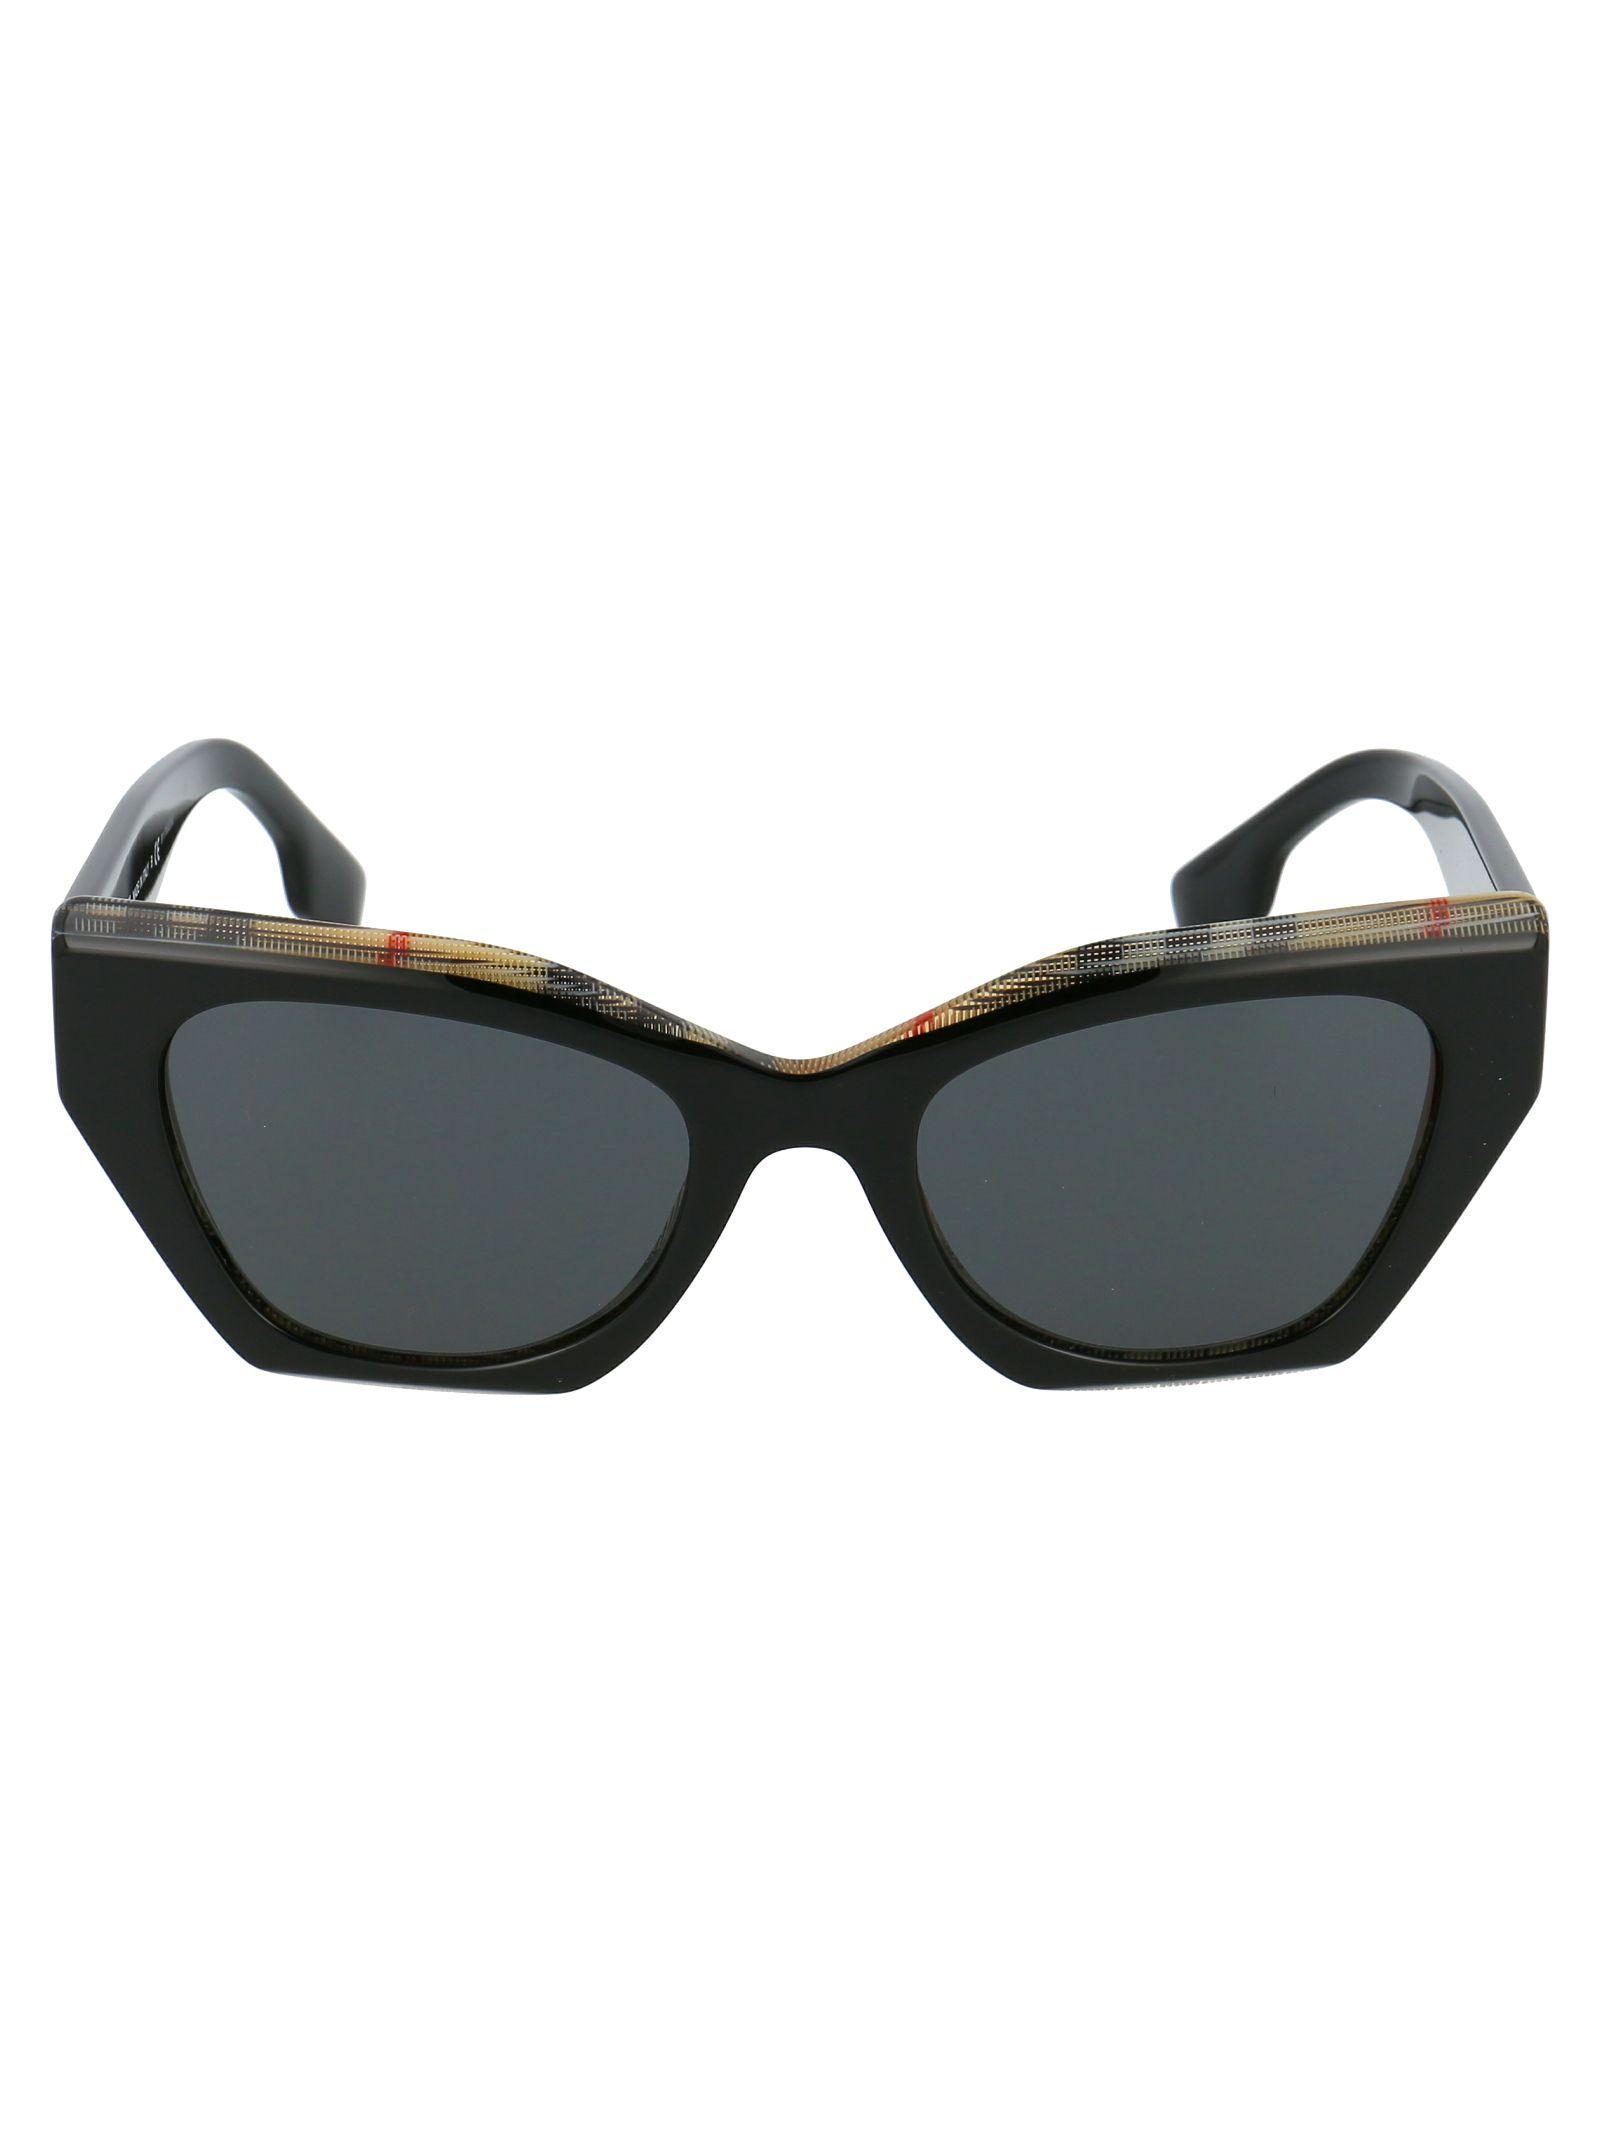 Burberry Women's Multicolor Metal Sunglasses